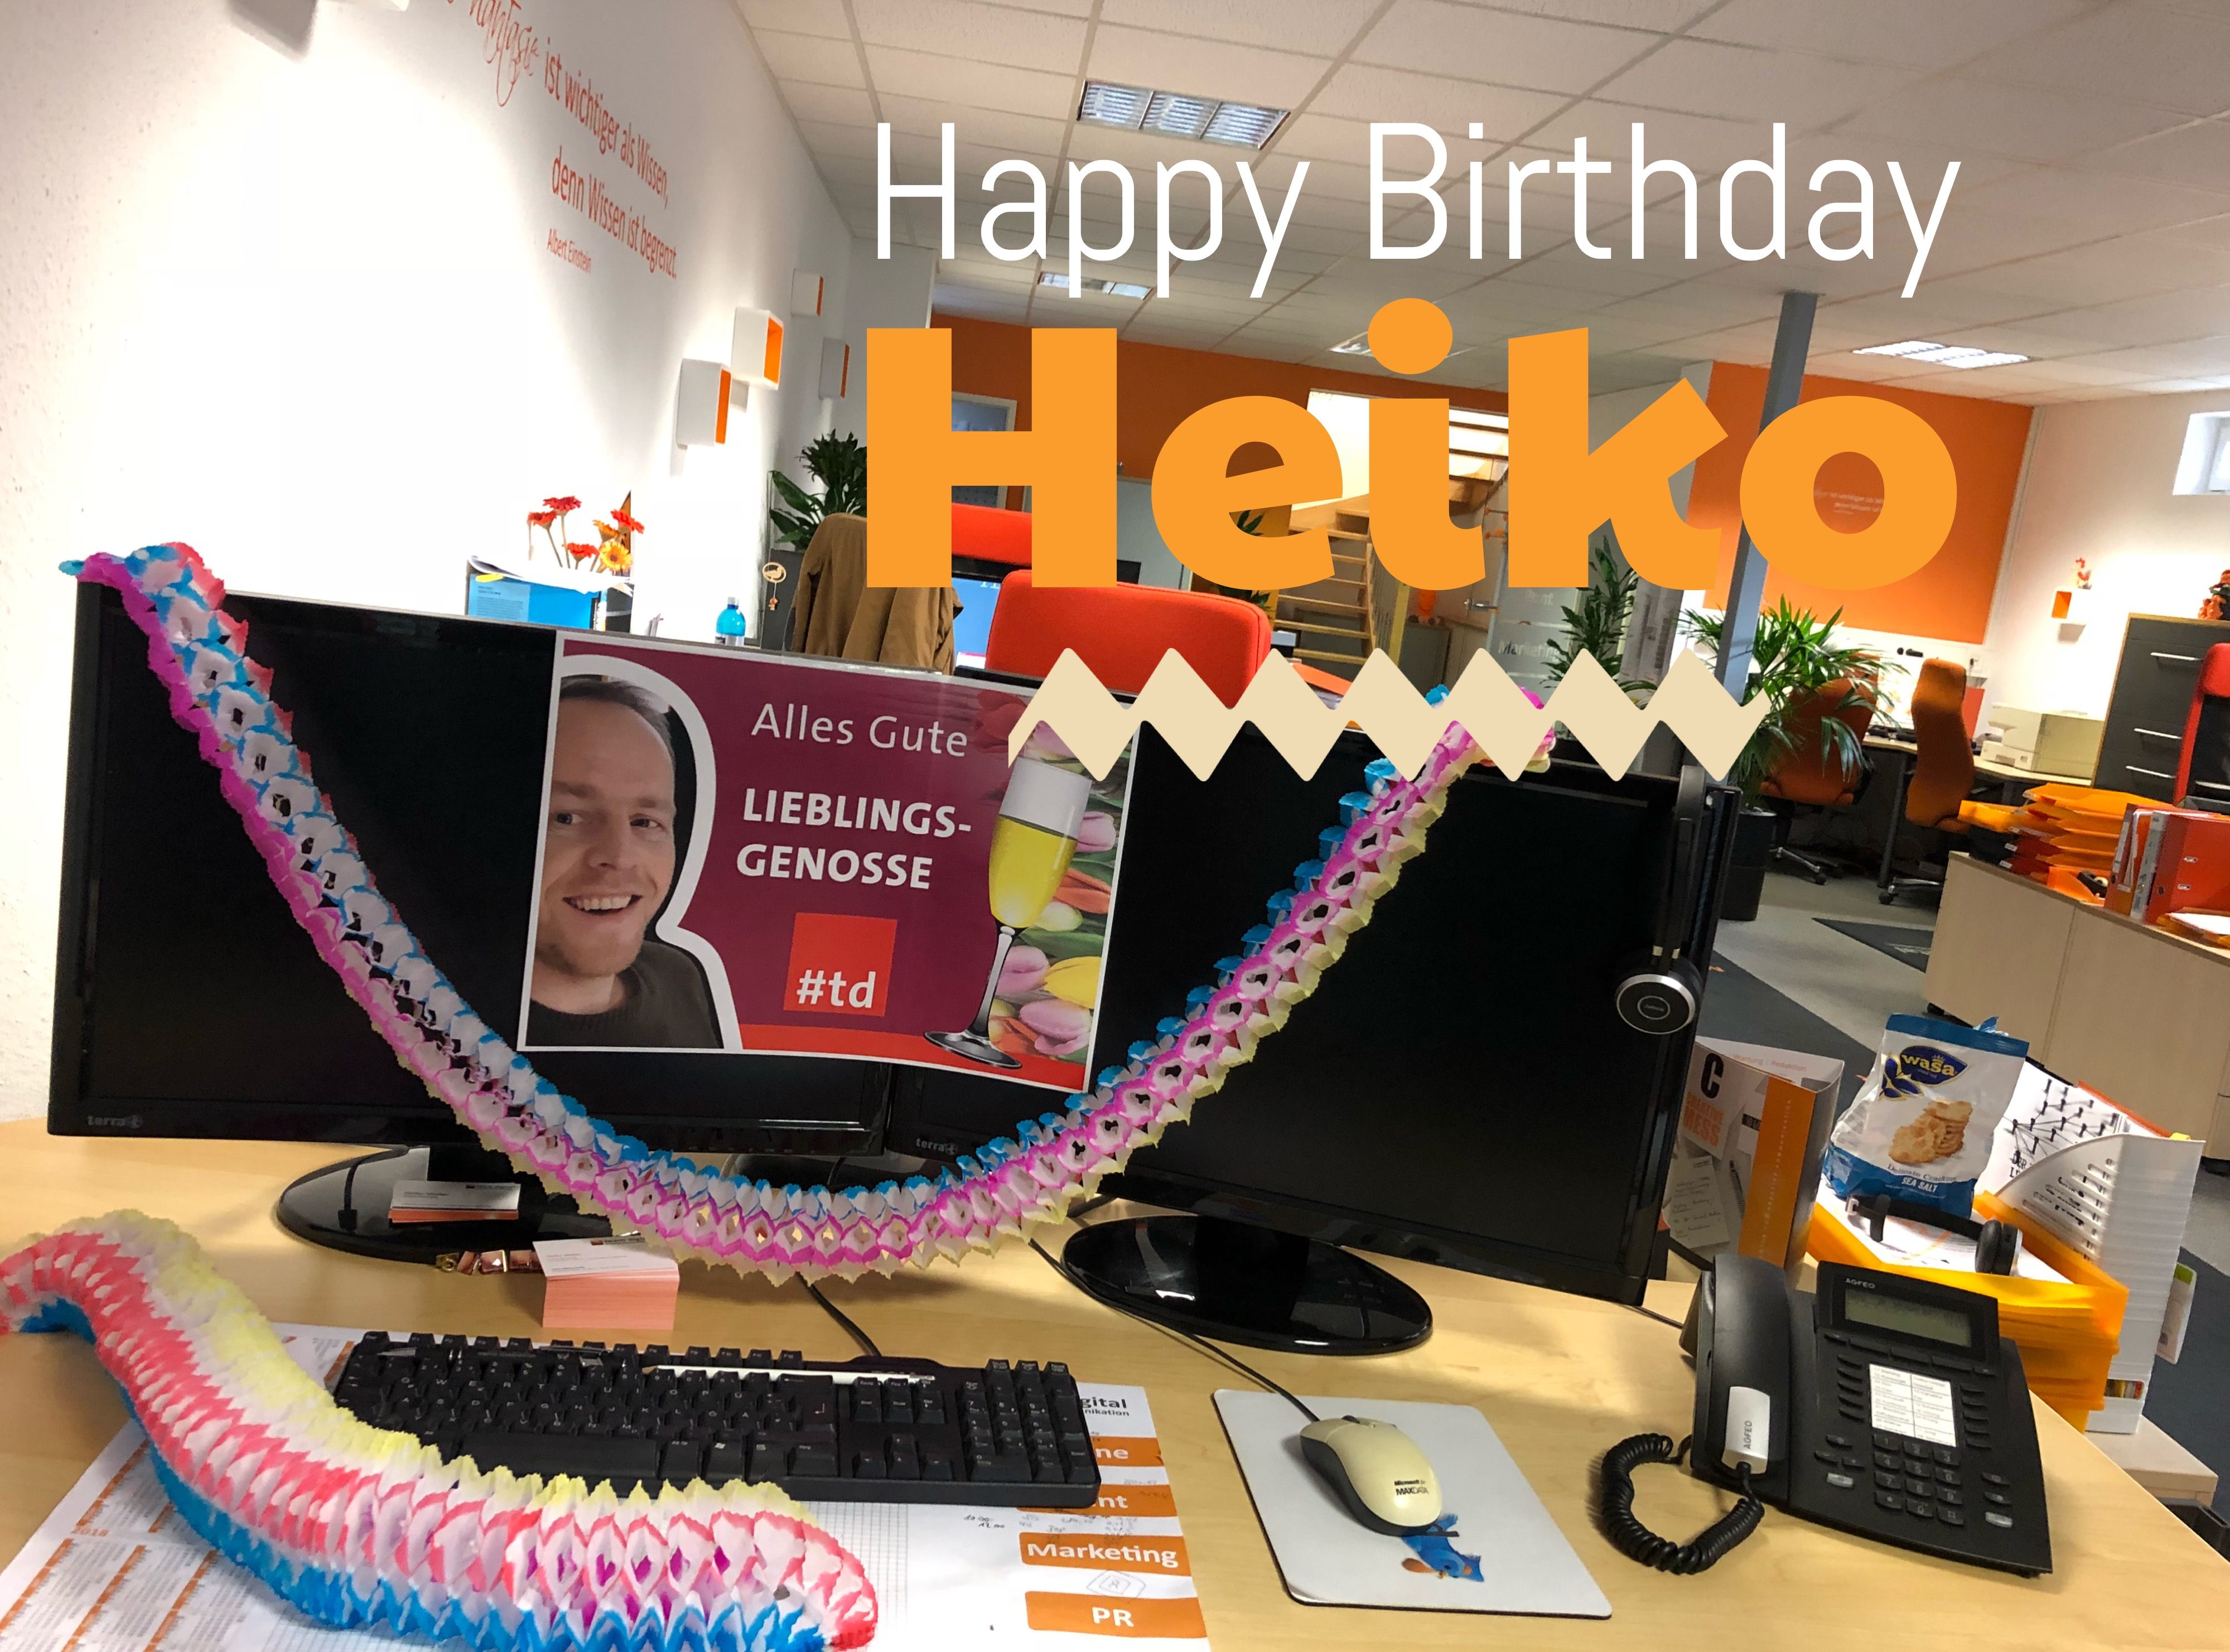 Happy Birthday Heiko